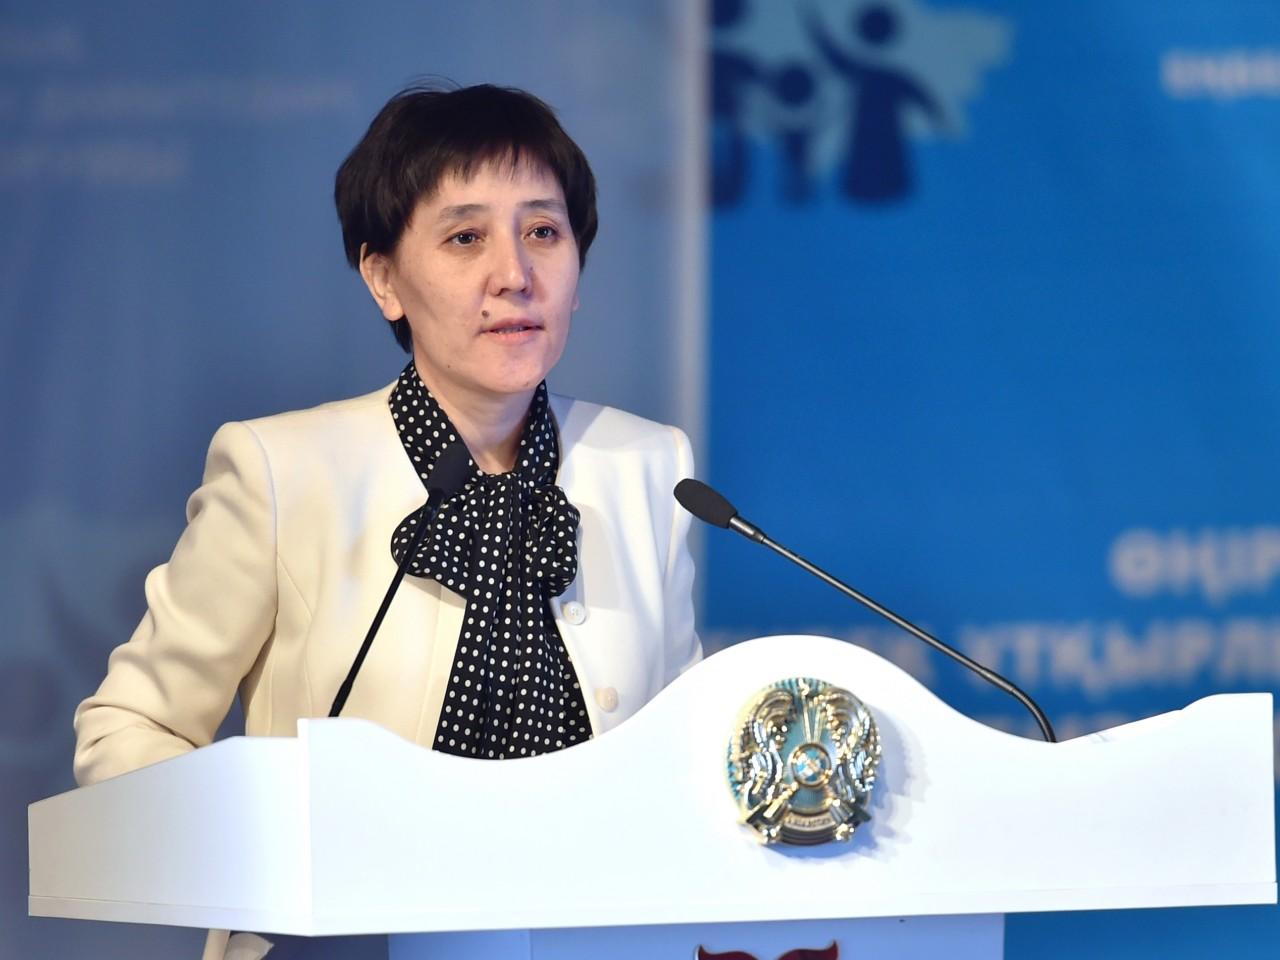 В связи с переходом на другую работу: Тамара Дуйсенова покинула пост